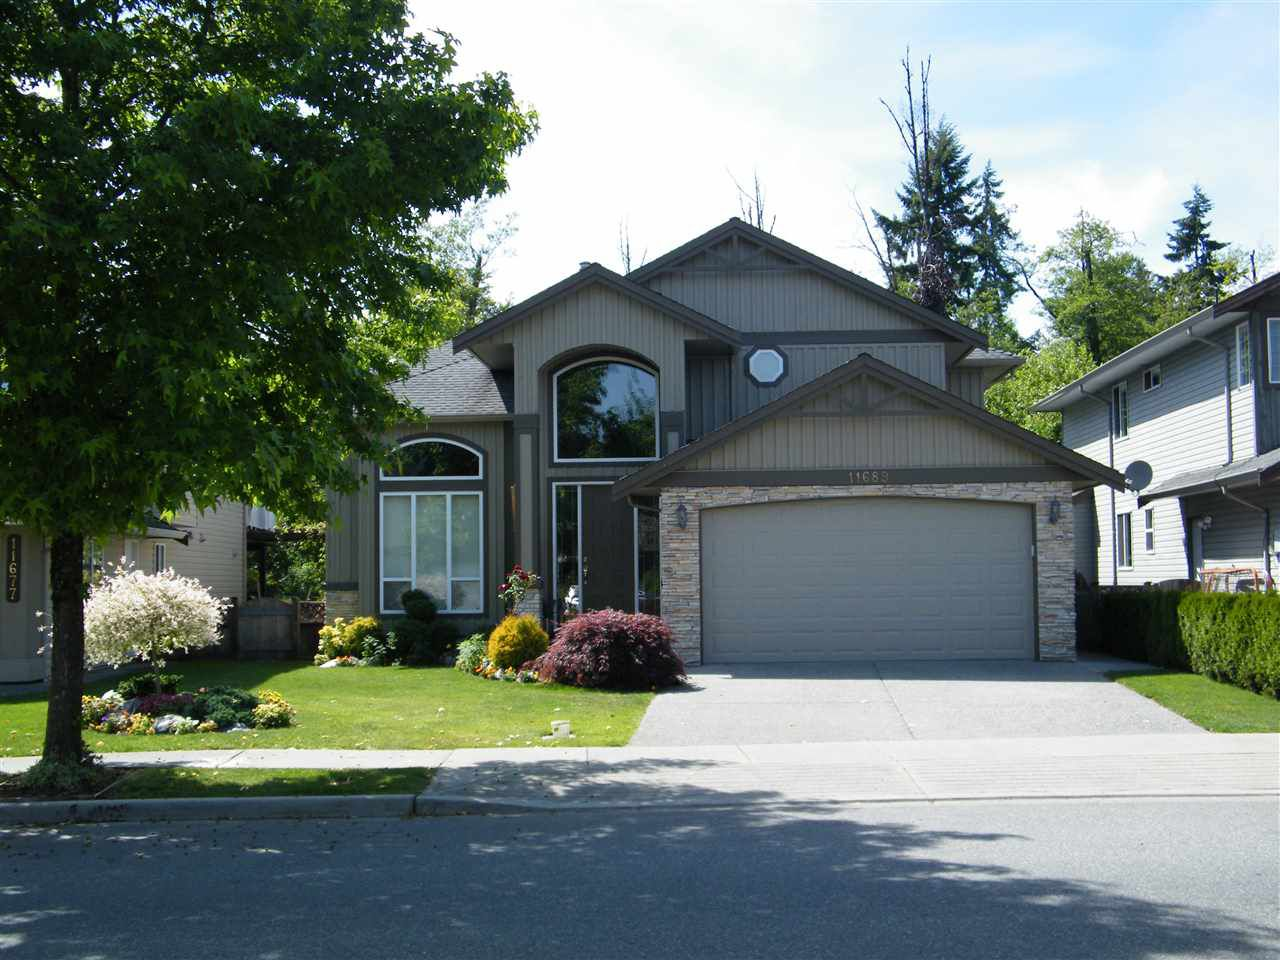 Main Photo: 11689 CREEKSIDE Street in Maple Ridge: Cottonwood MR House for sale : MLS®# R2000625